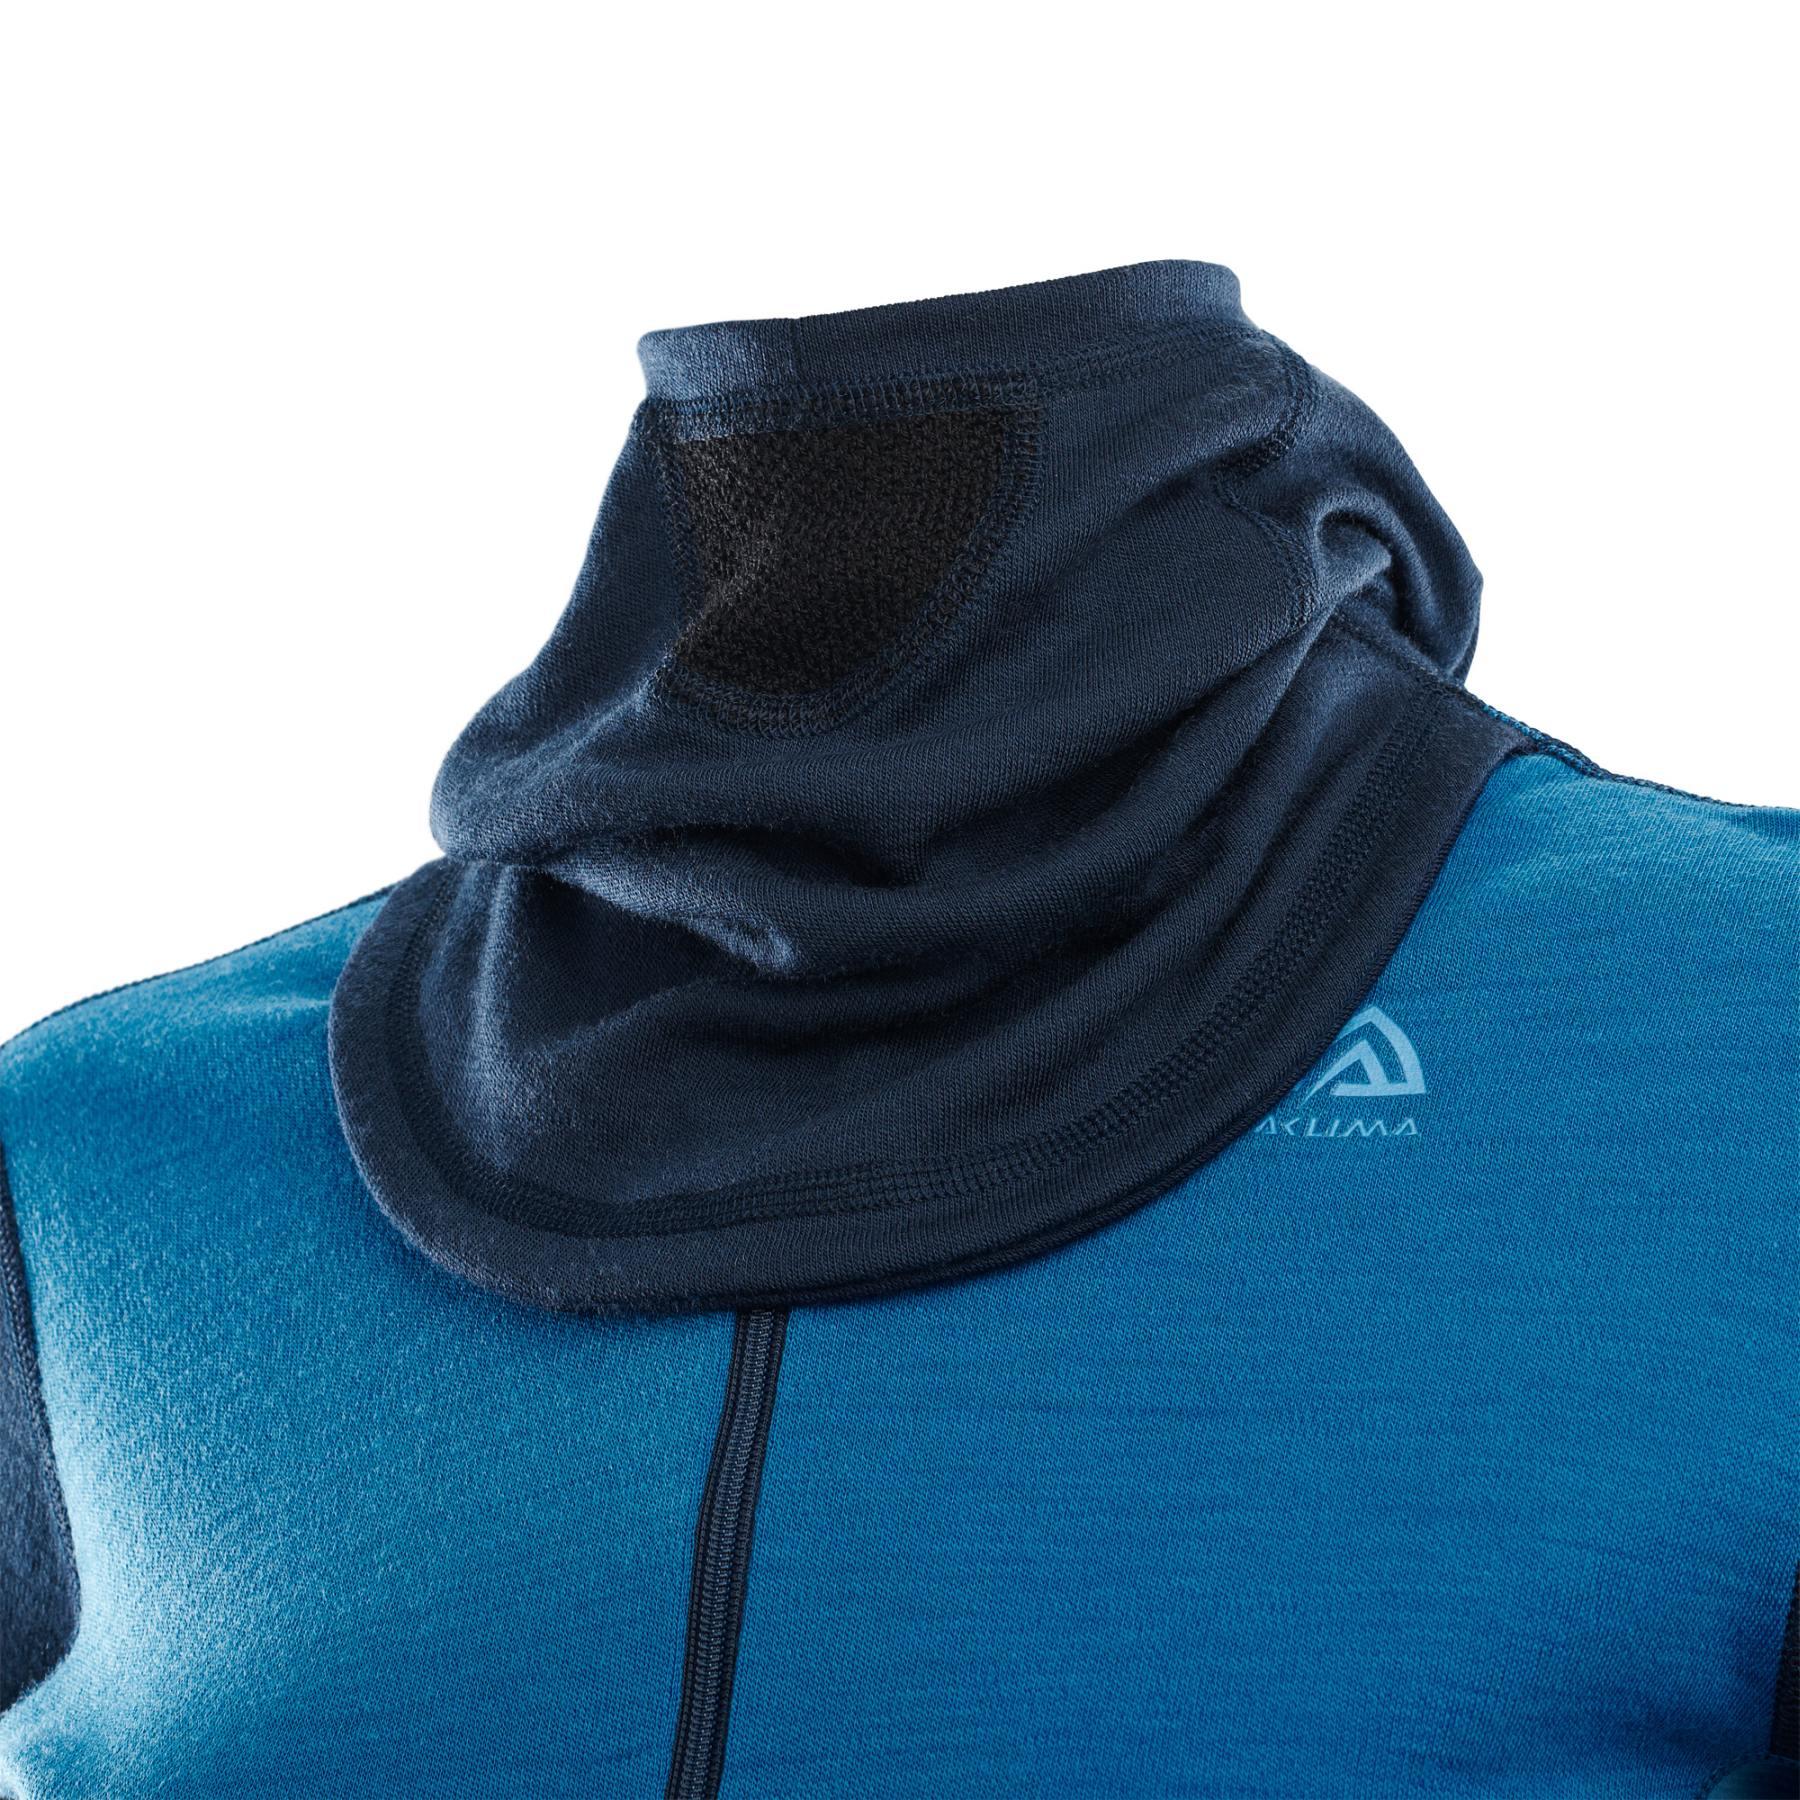 Image of Aclima Warmwool Women's Hood Sweater with Zipper - navy blazer/blue sapphire/azure blue